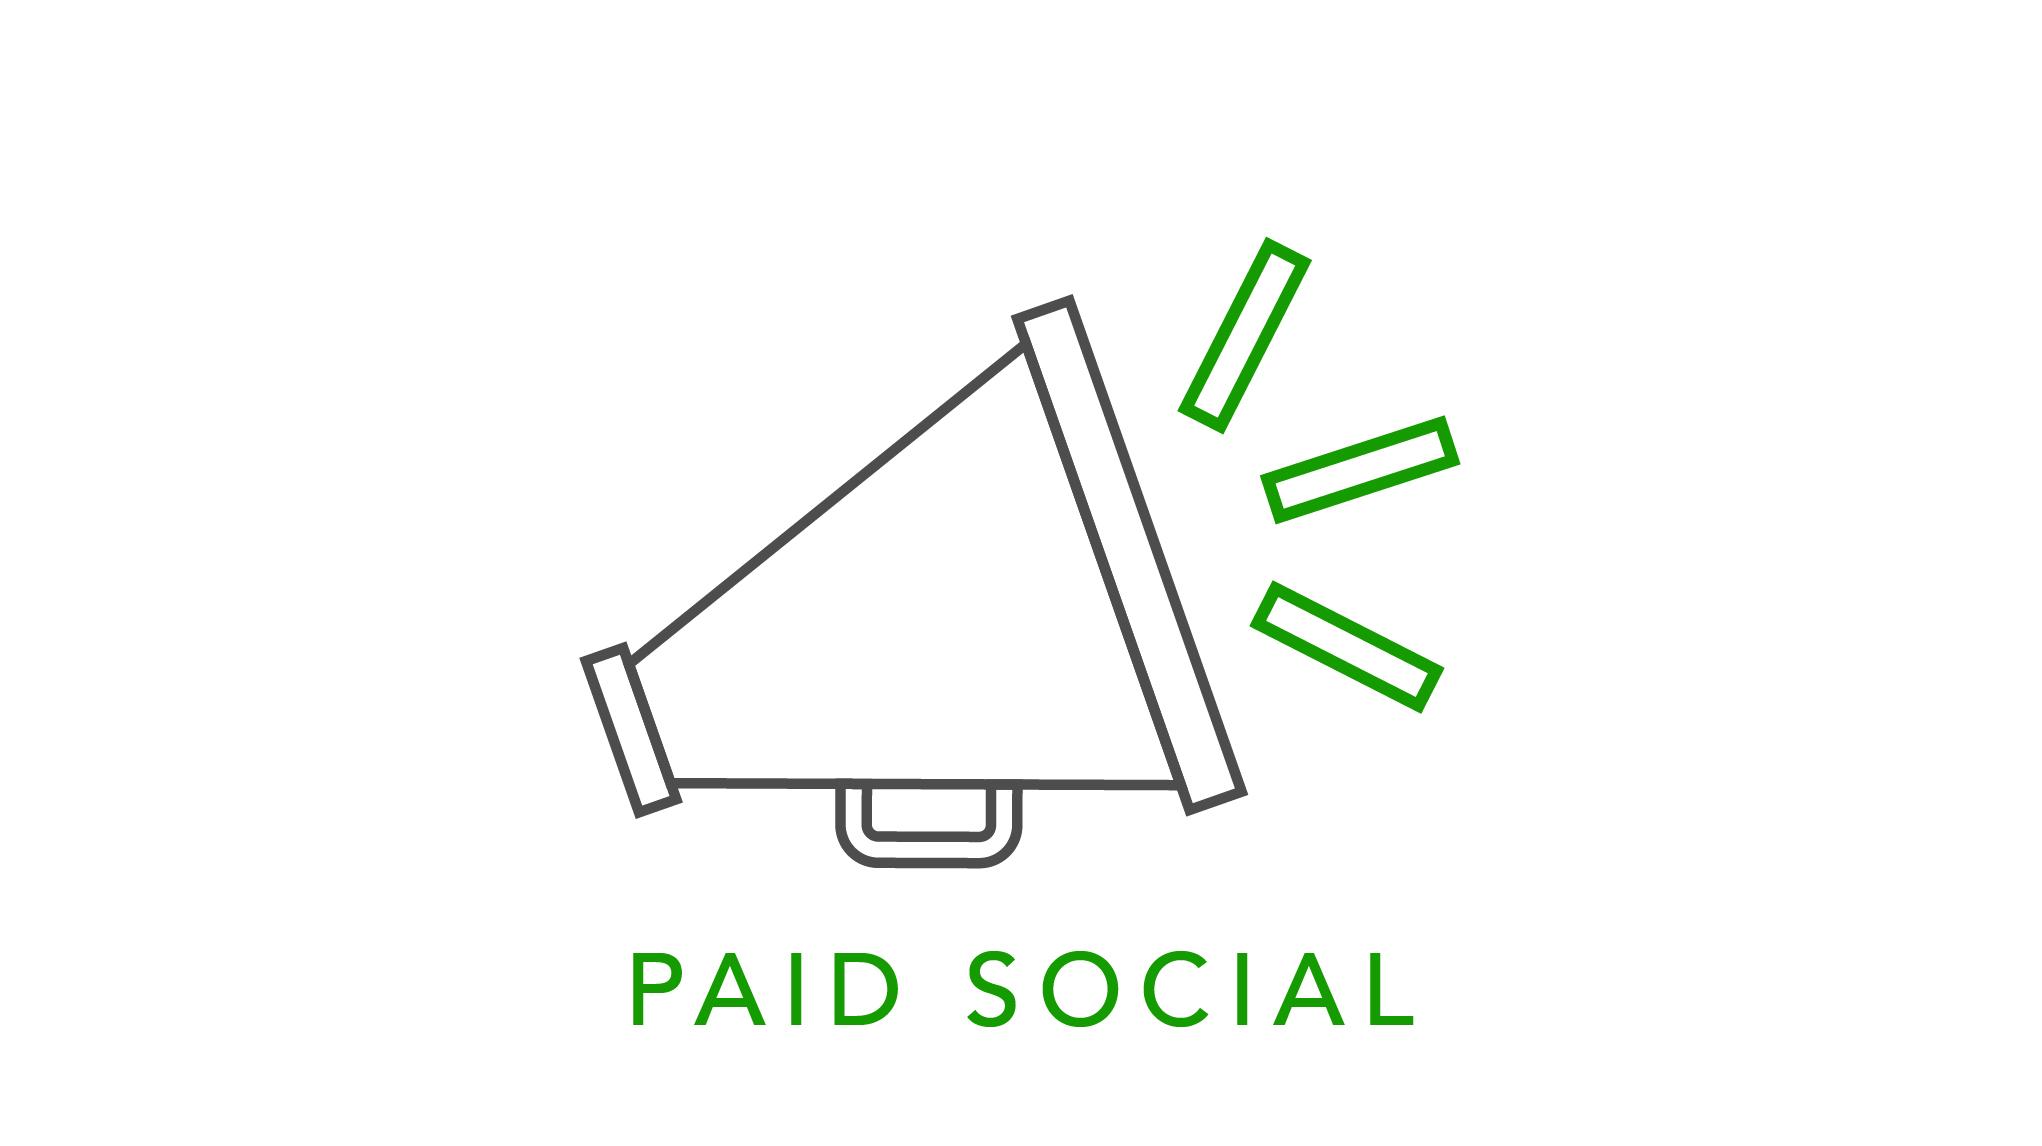 Paid Social Module at Wolfgang University